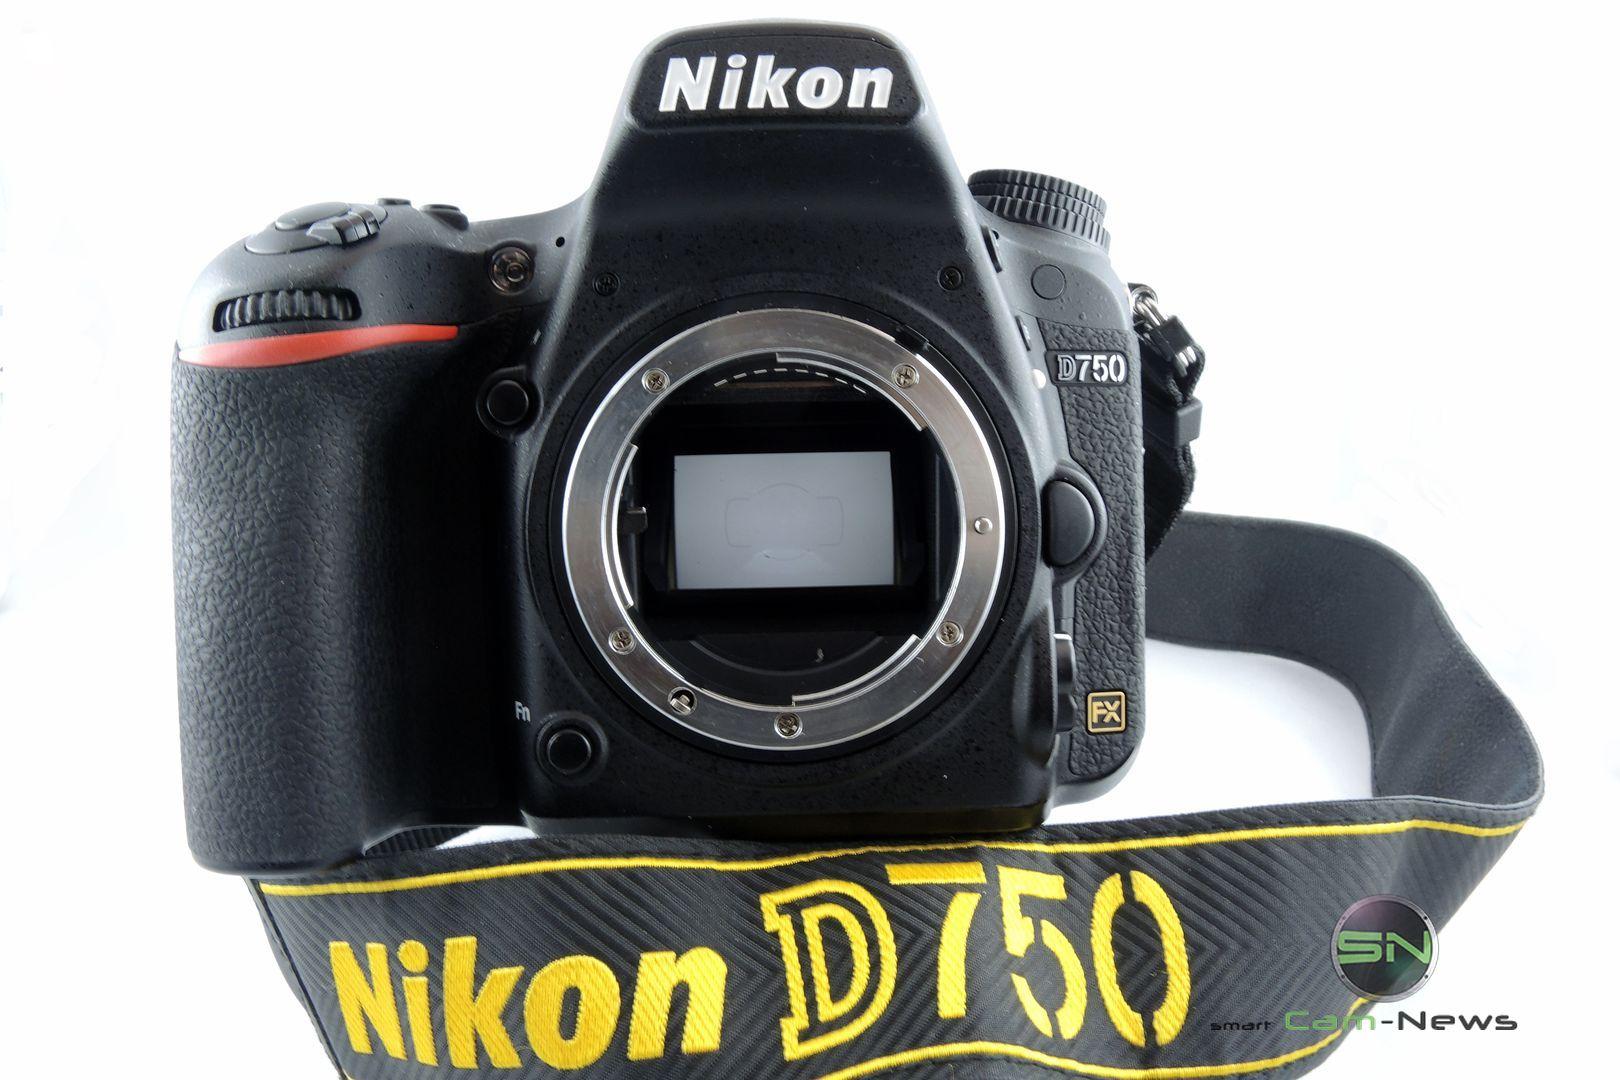 Nikon D750 - Nikkor FX 24-120mm - Neuseeland Reise - SmartCamNews